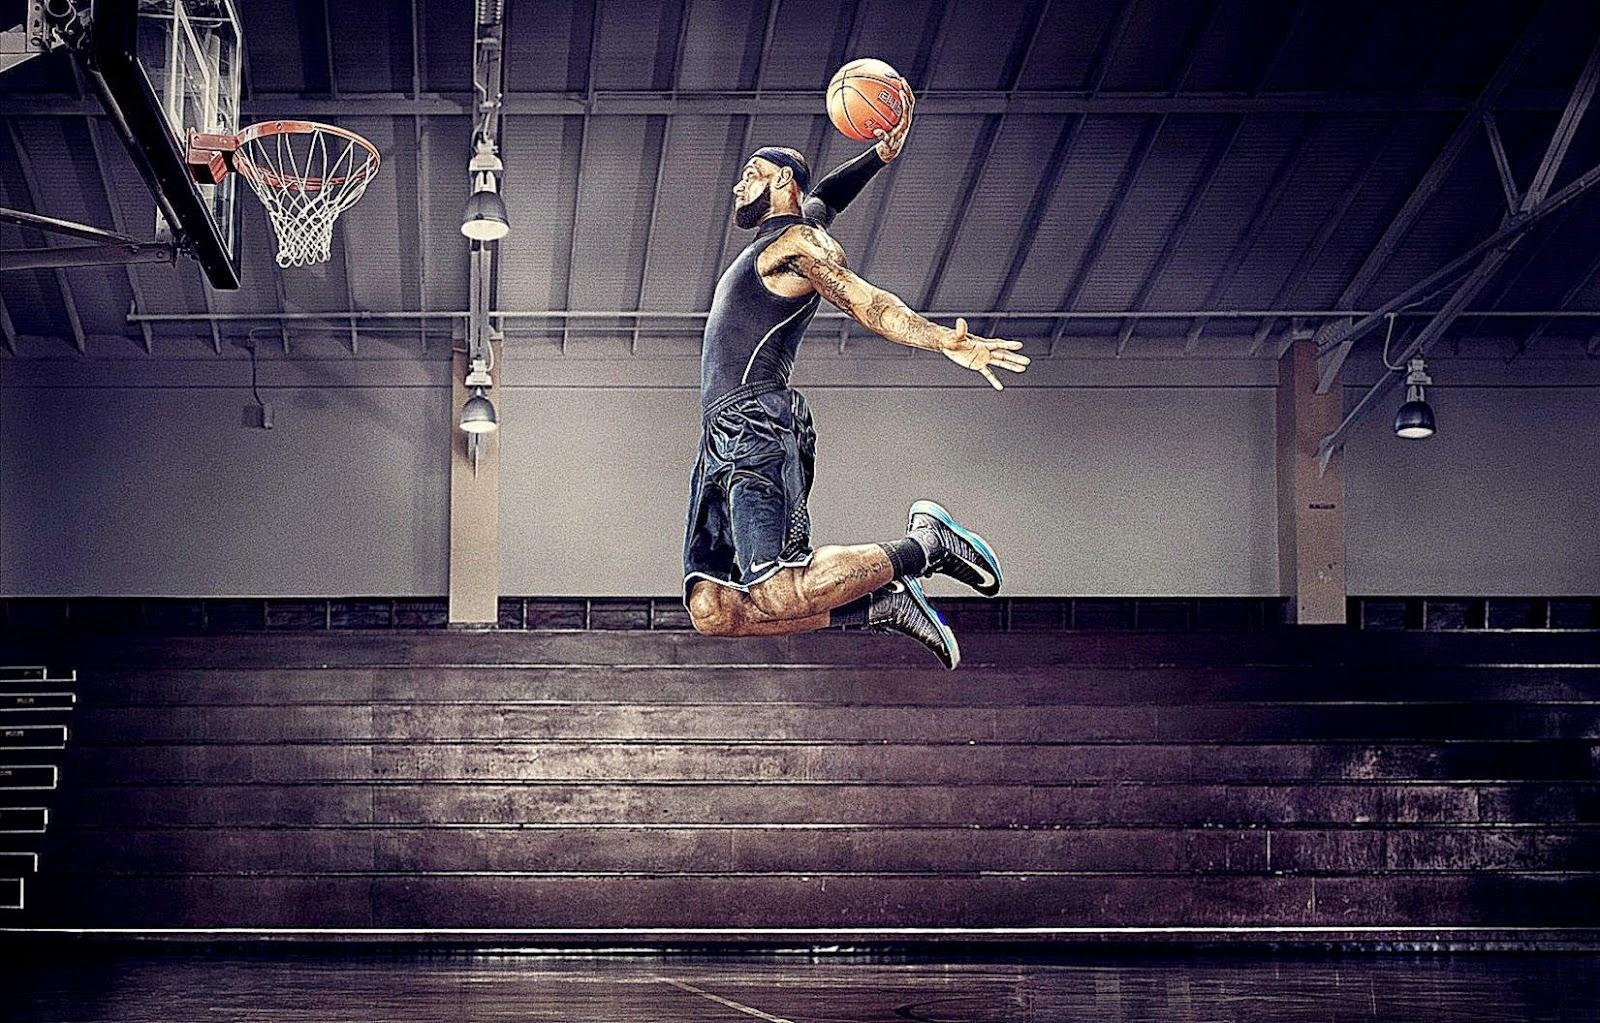 Cool Hd Wallpapers Nike Basketball Wallpaper